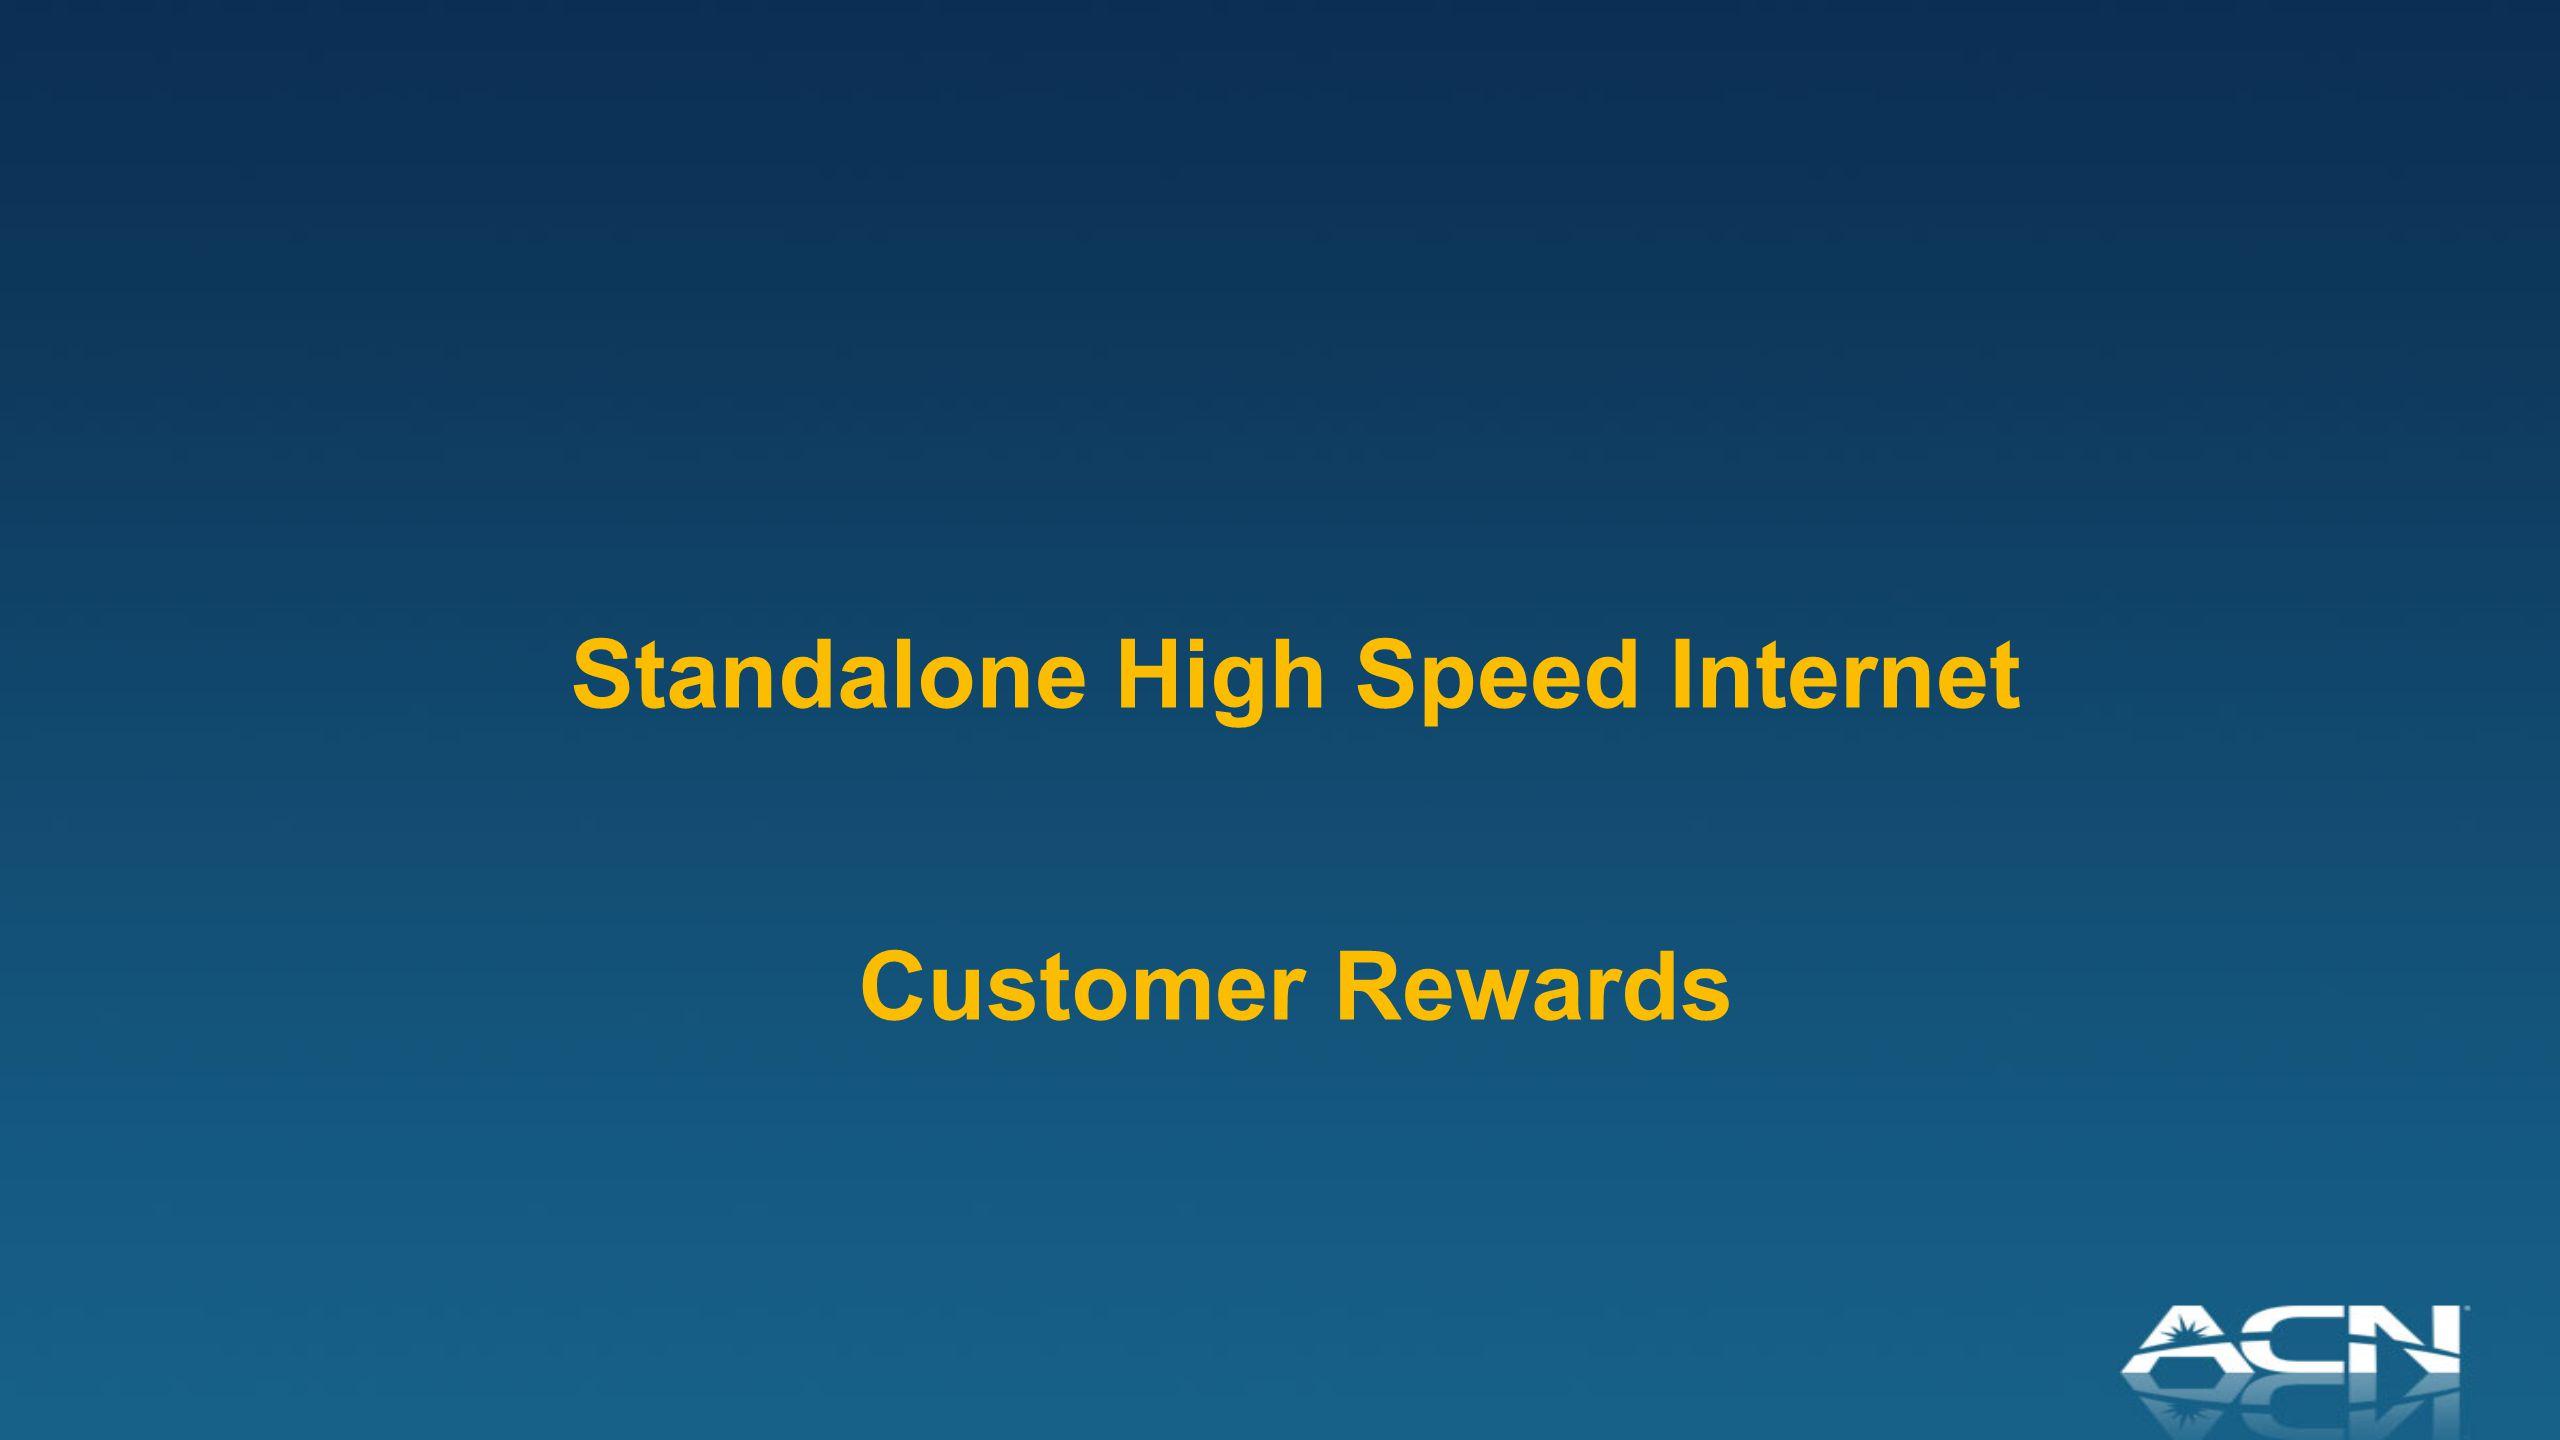 Standalone High Speed Internet Customer Rewards